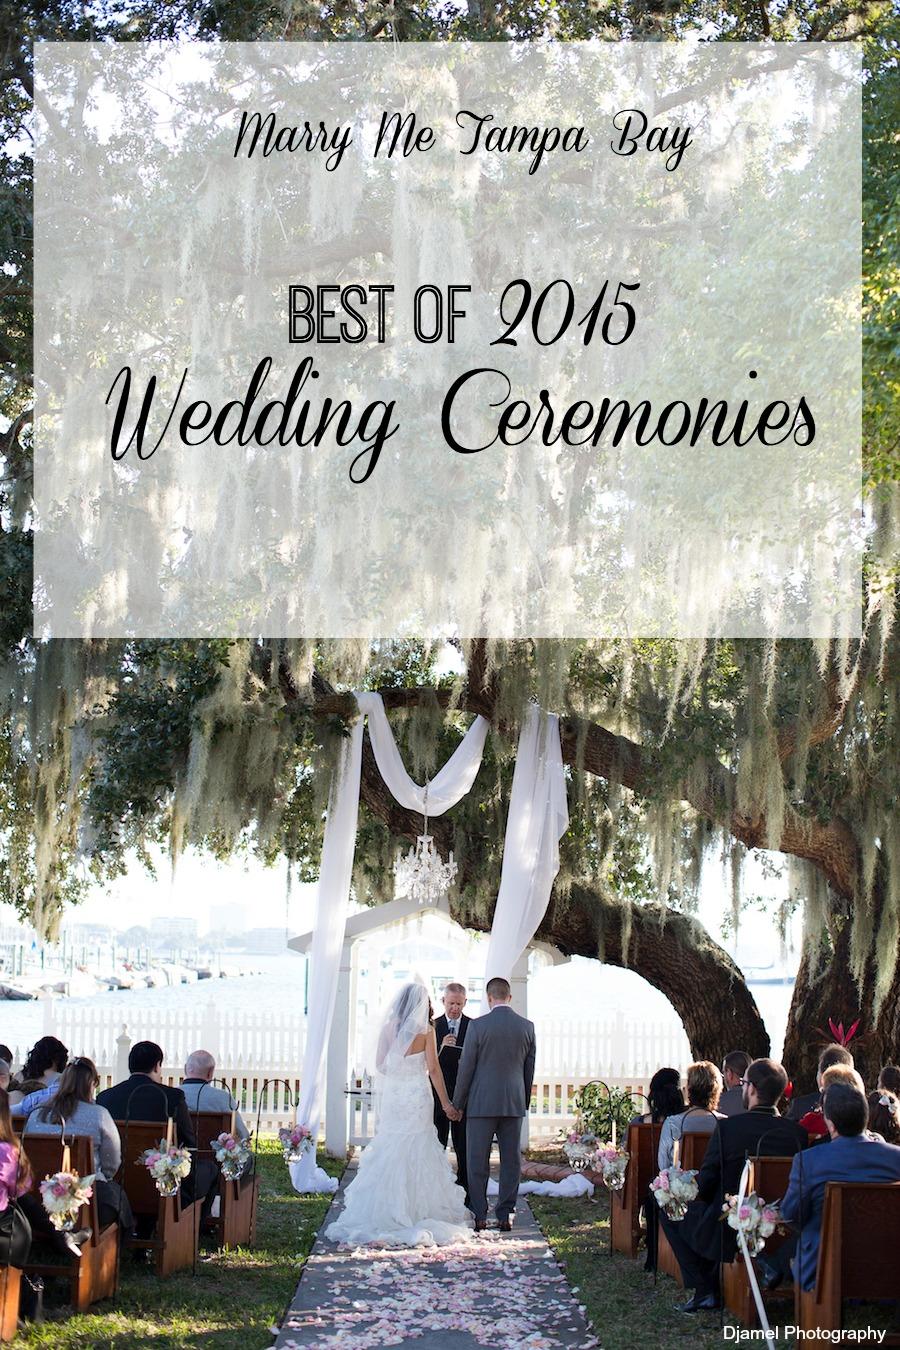 Marry Me Tampa Bay Wedding Best of 2015 - Tampa Bay Wedding Ceremony Venue Locations Wedding Photos